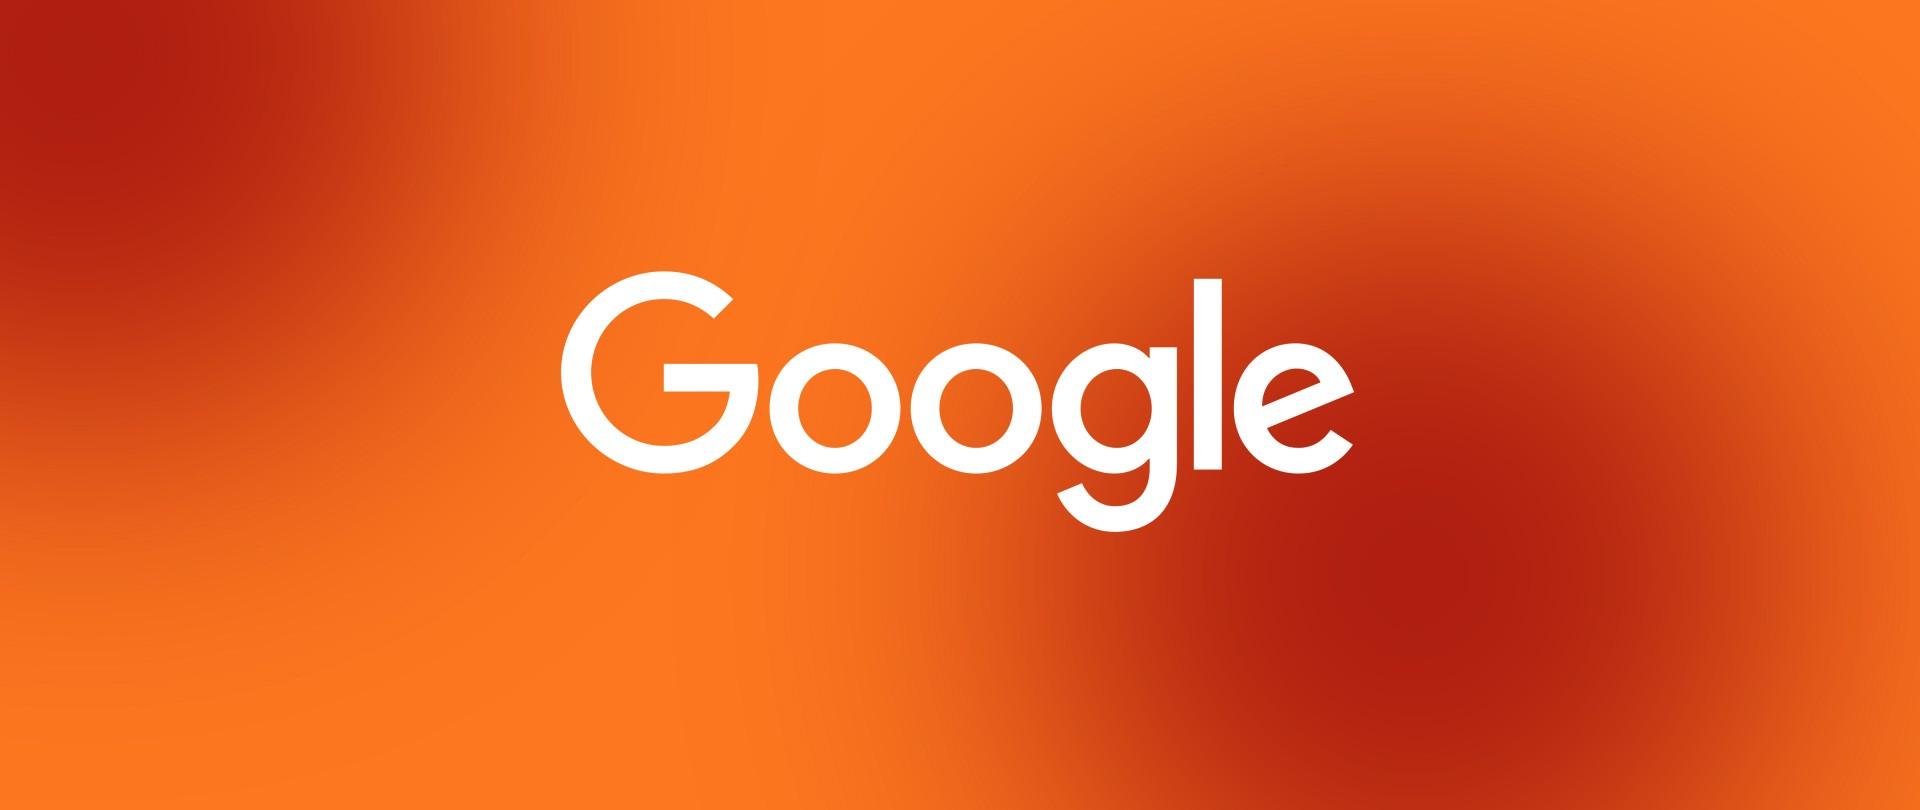 Foto: 25s vinte e cinco segundos técnica de leitura da busca no Google